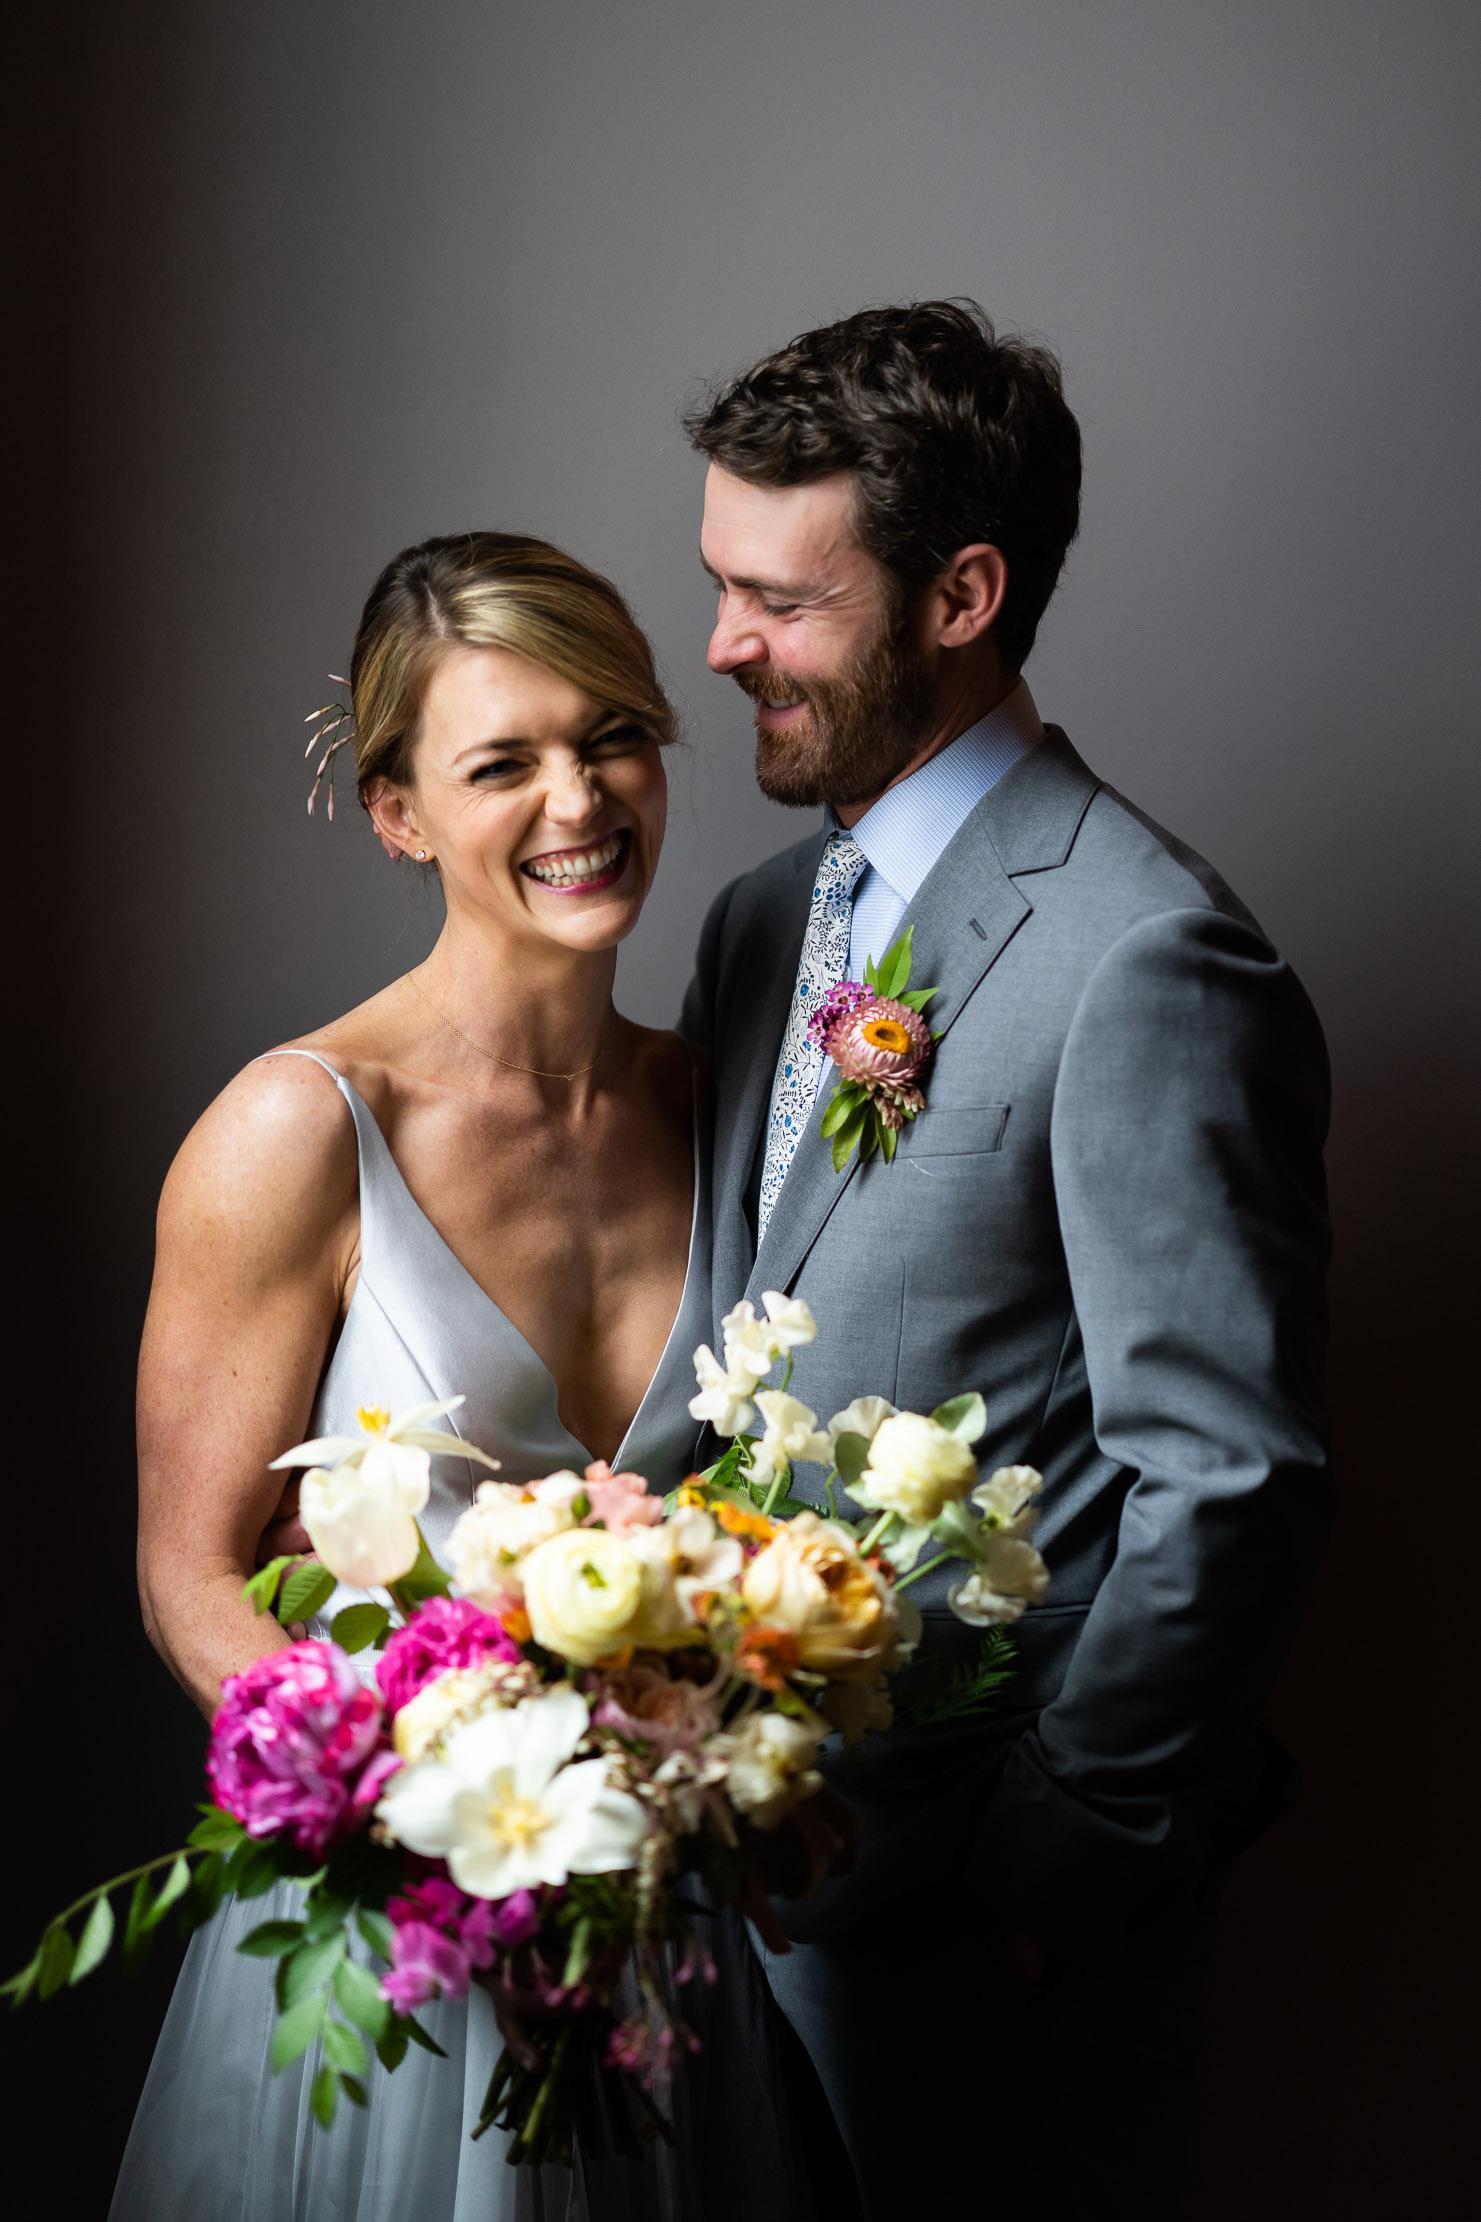 Matties-Green-Pastures-Austin-Wedding-2028.jpg